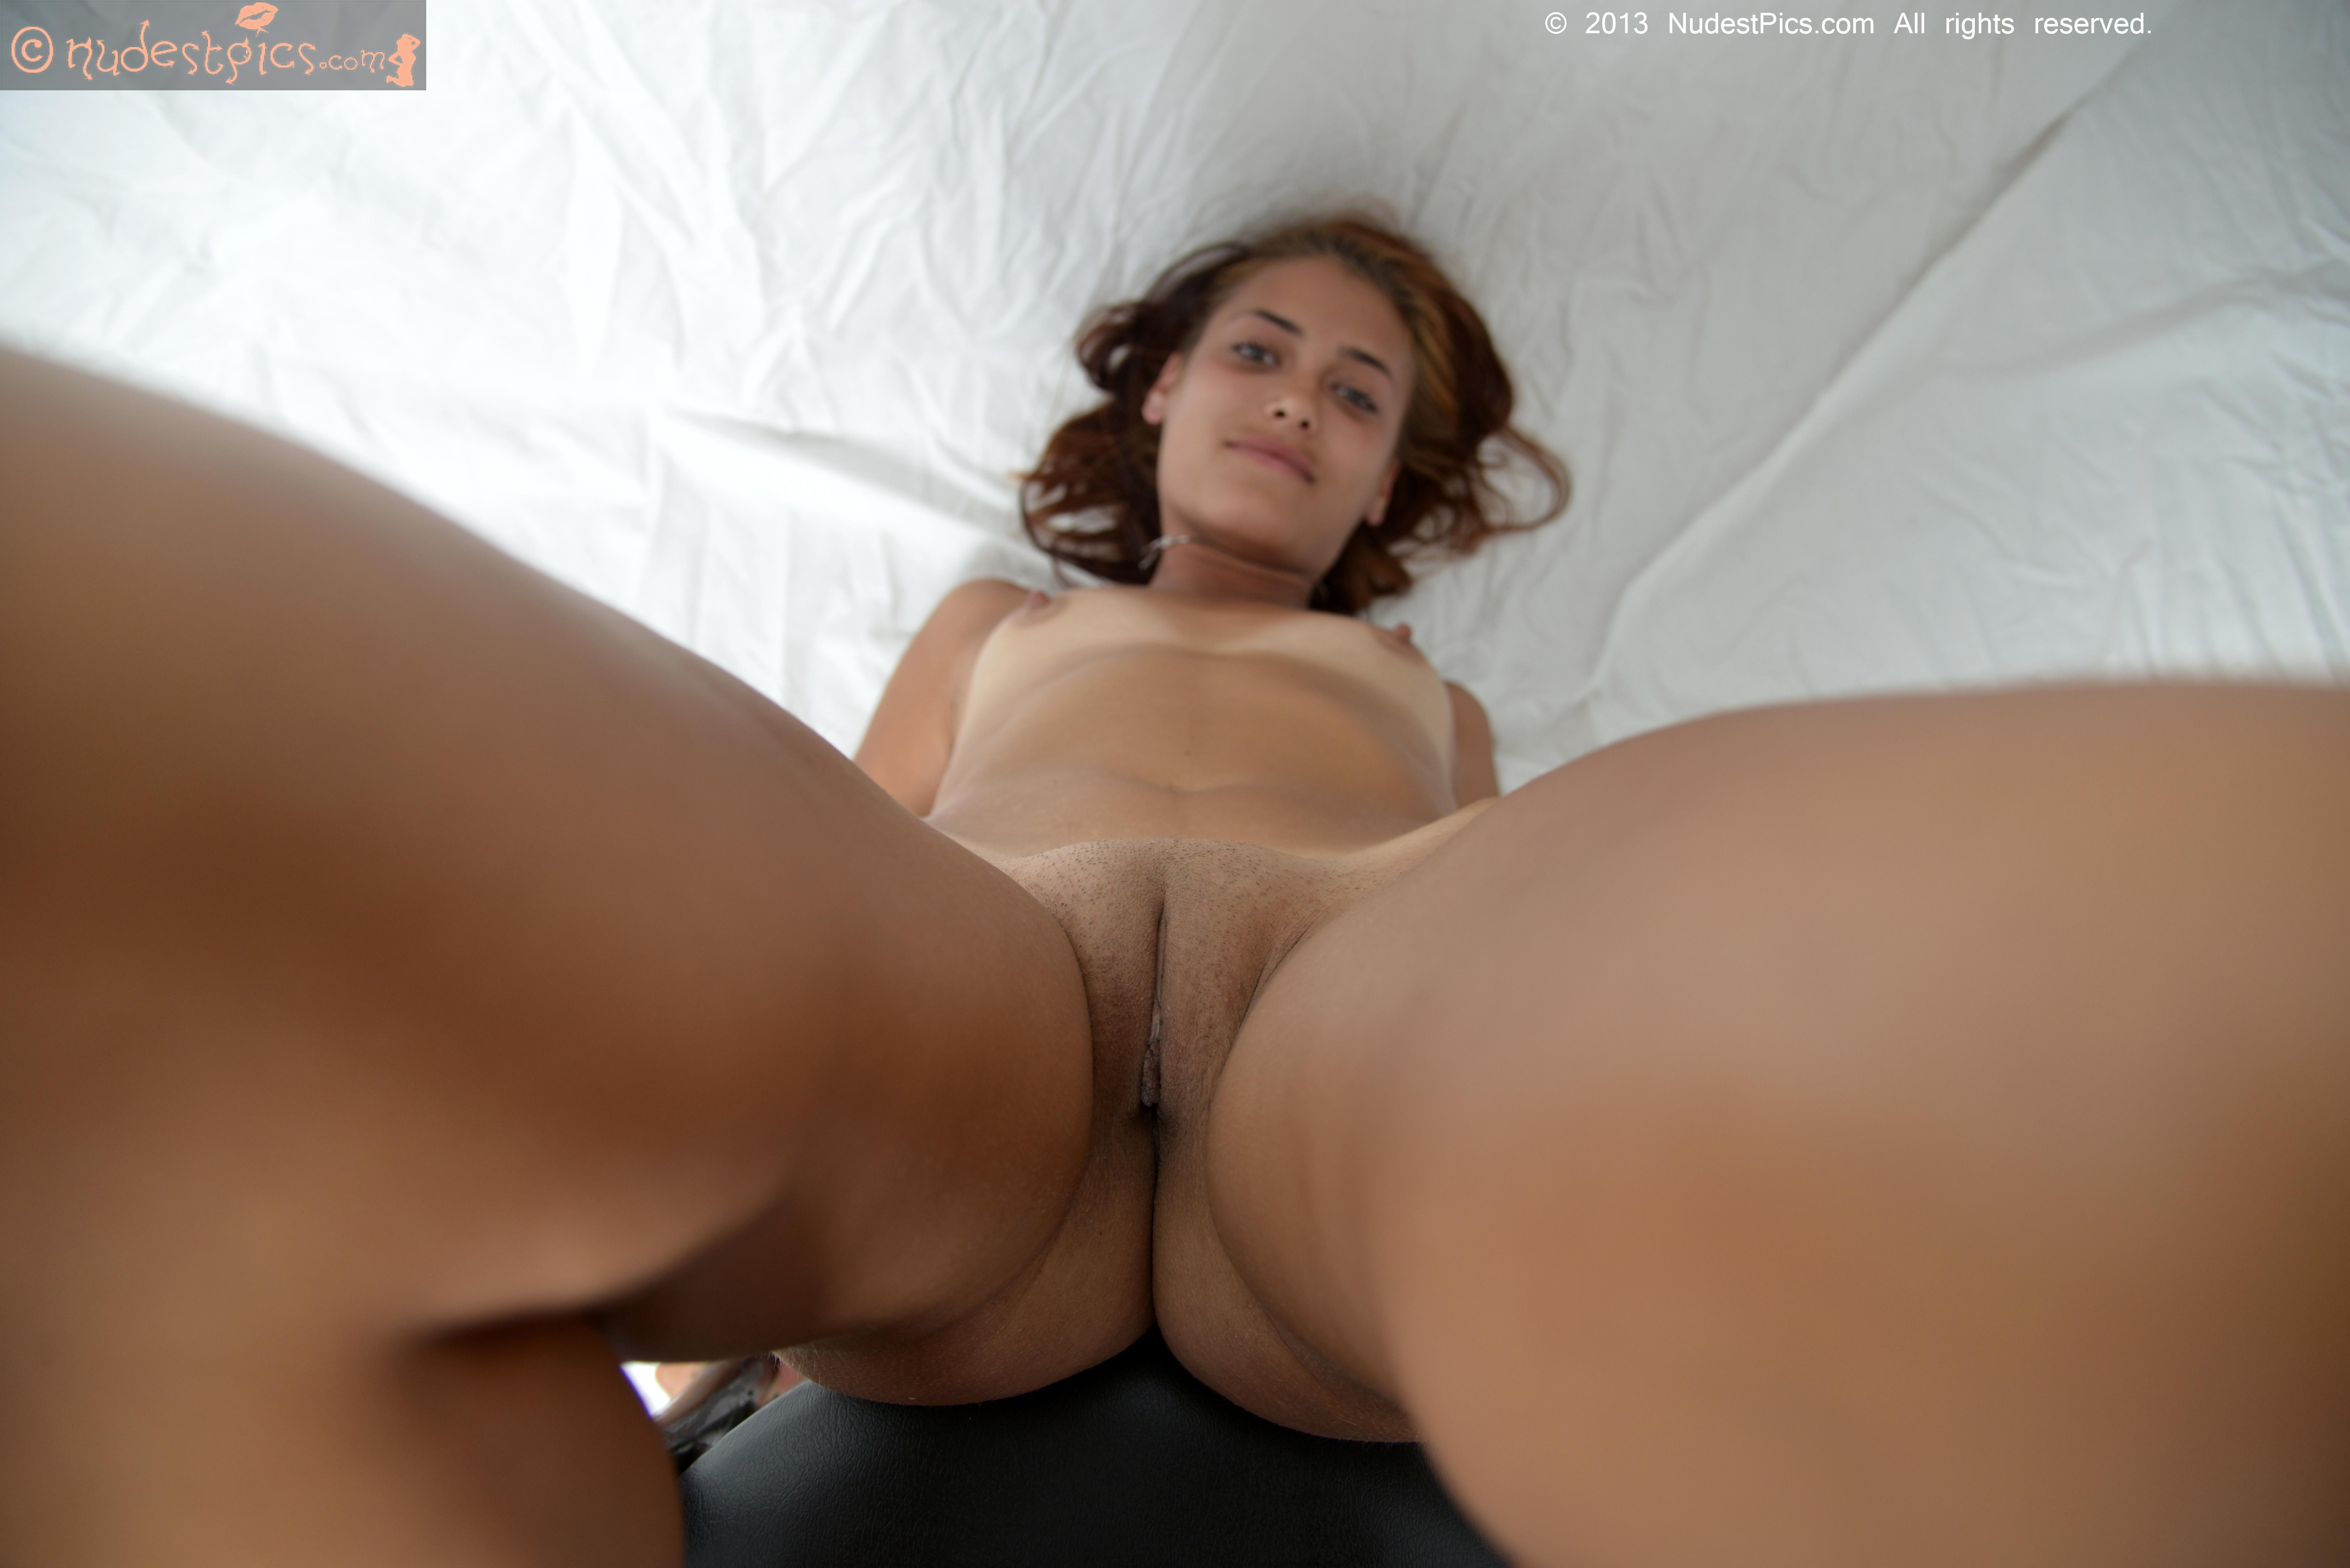 New nude funny wallpaper porn scenes